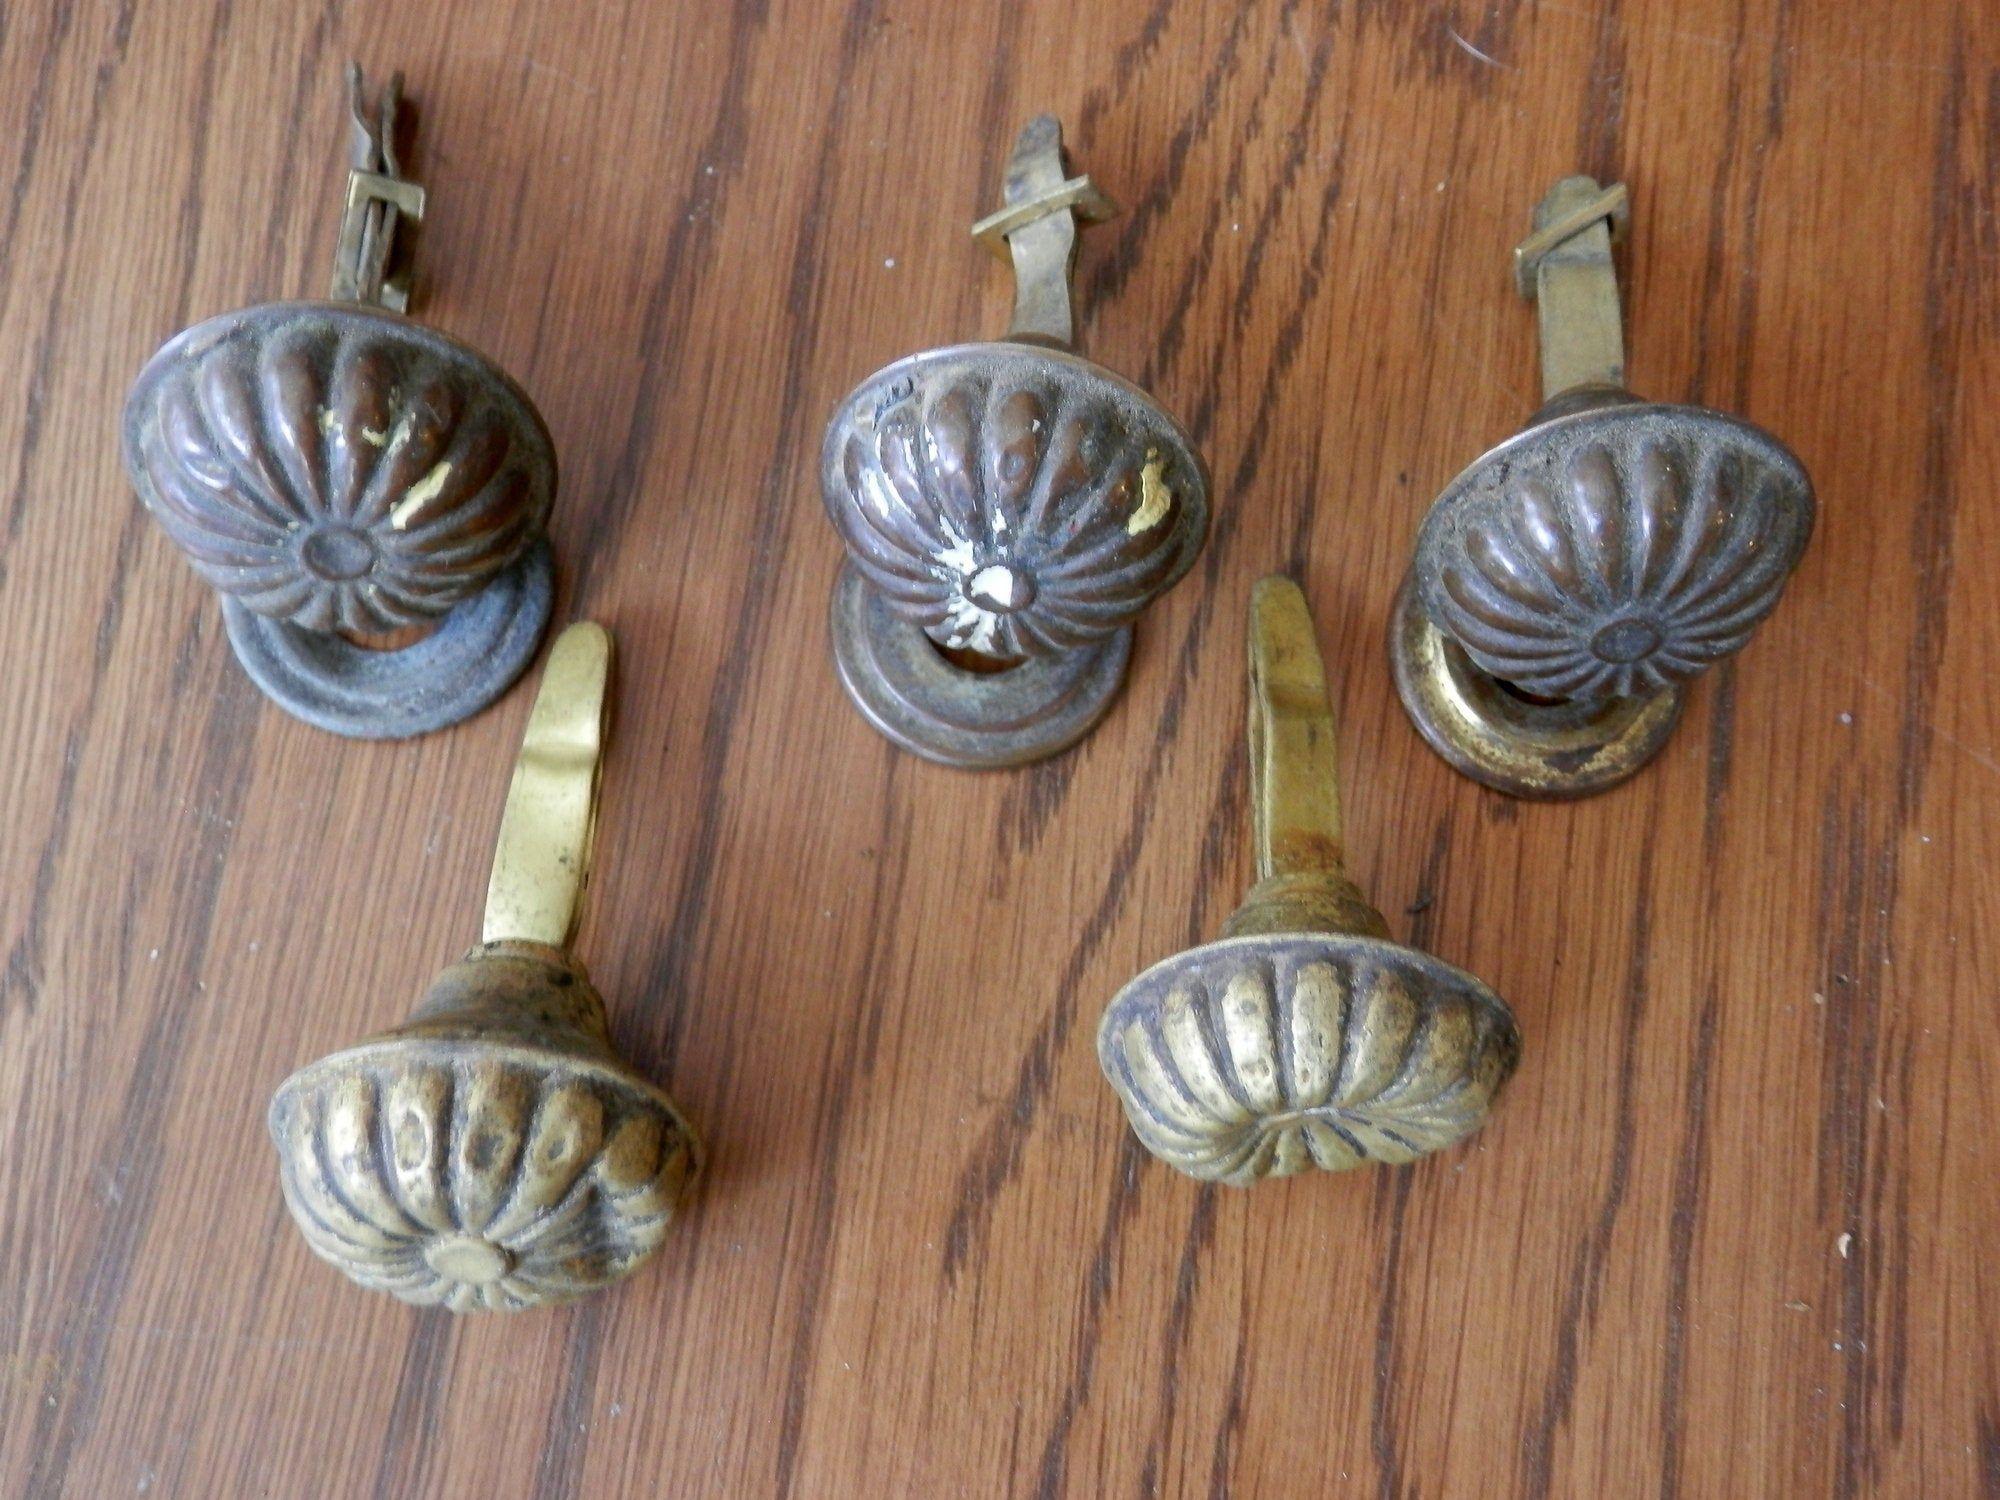 Duncan Phyfe antique hardware  Brass drawer pull cabinet knob..finger pull